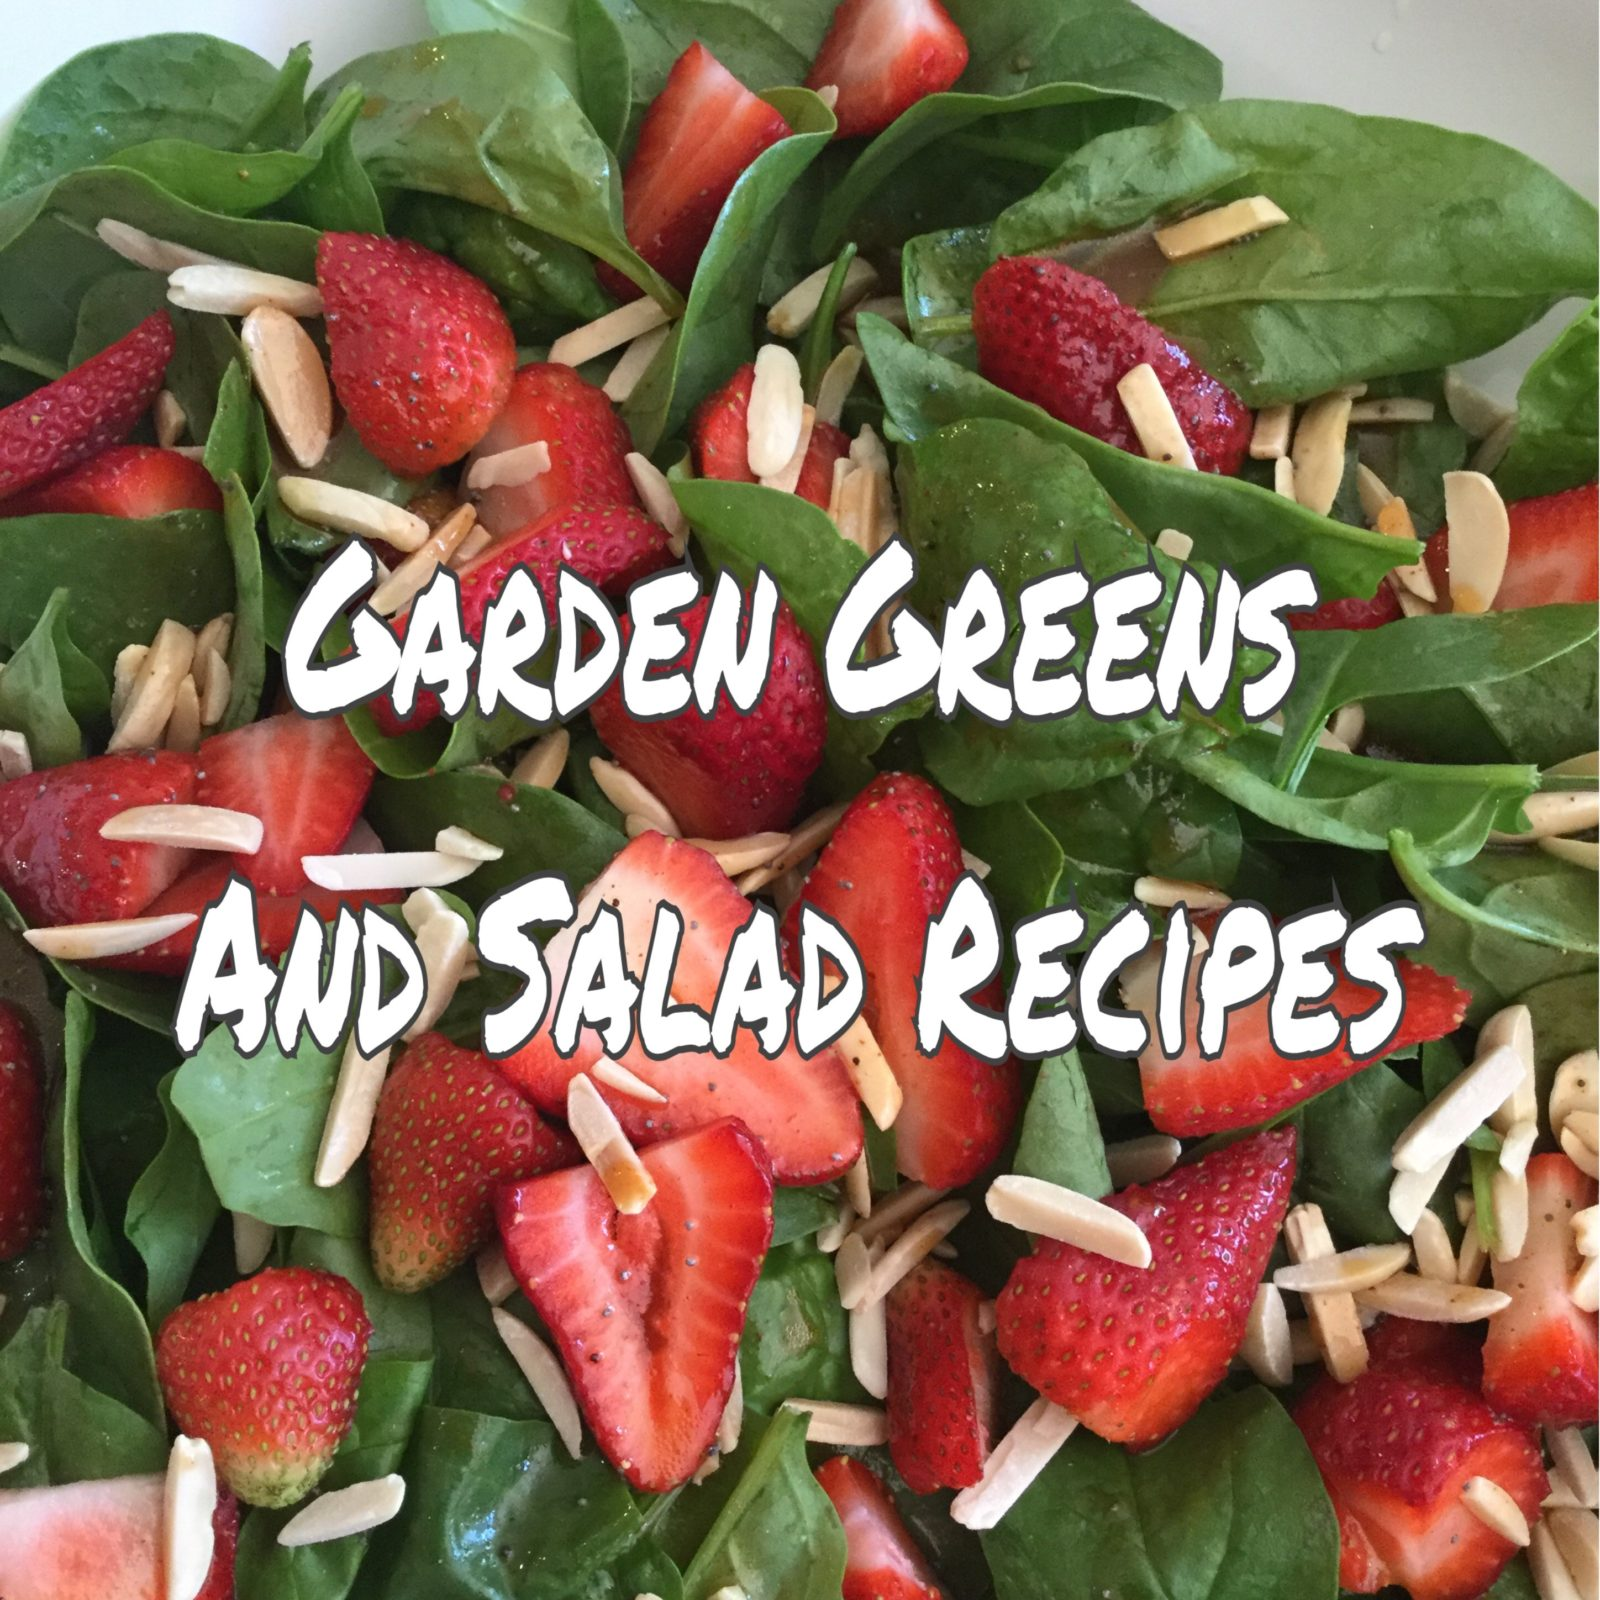 Garden Greens and Salad Recipes